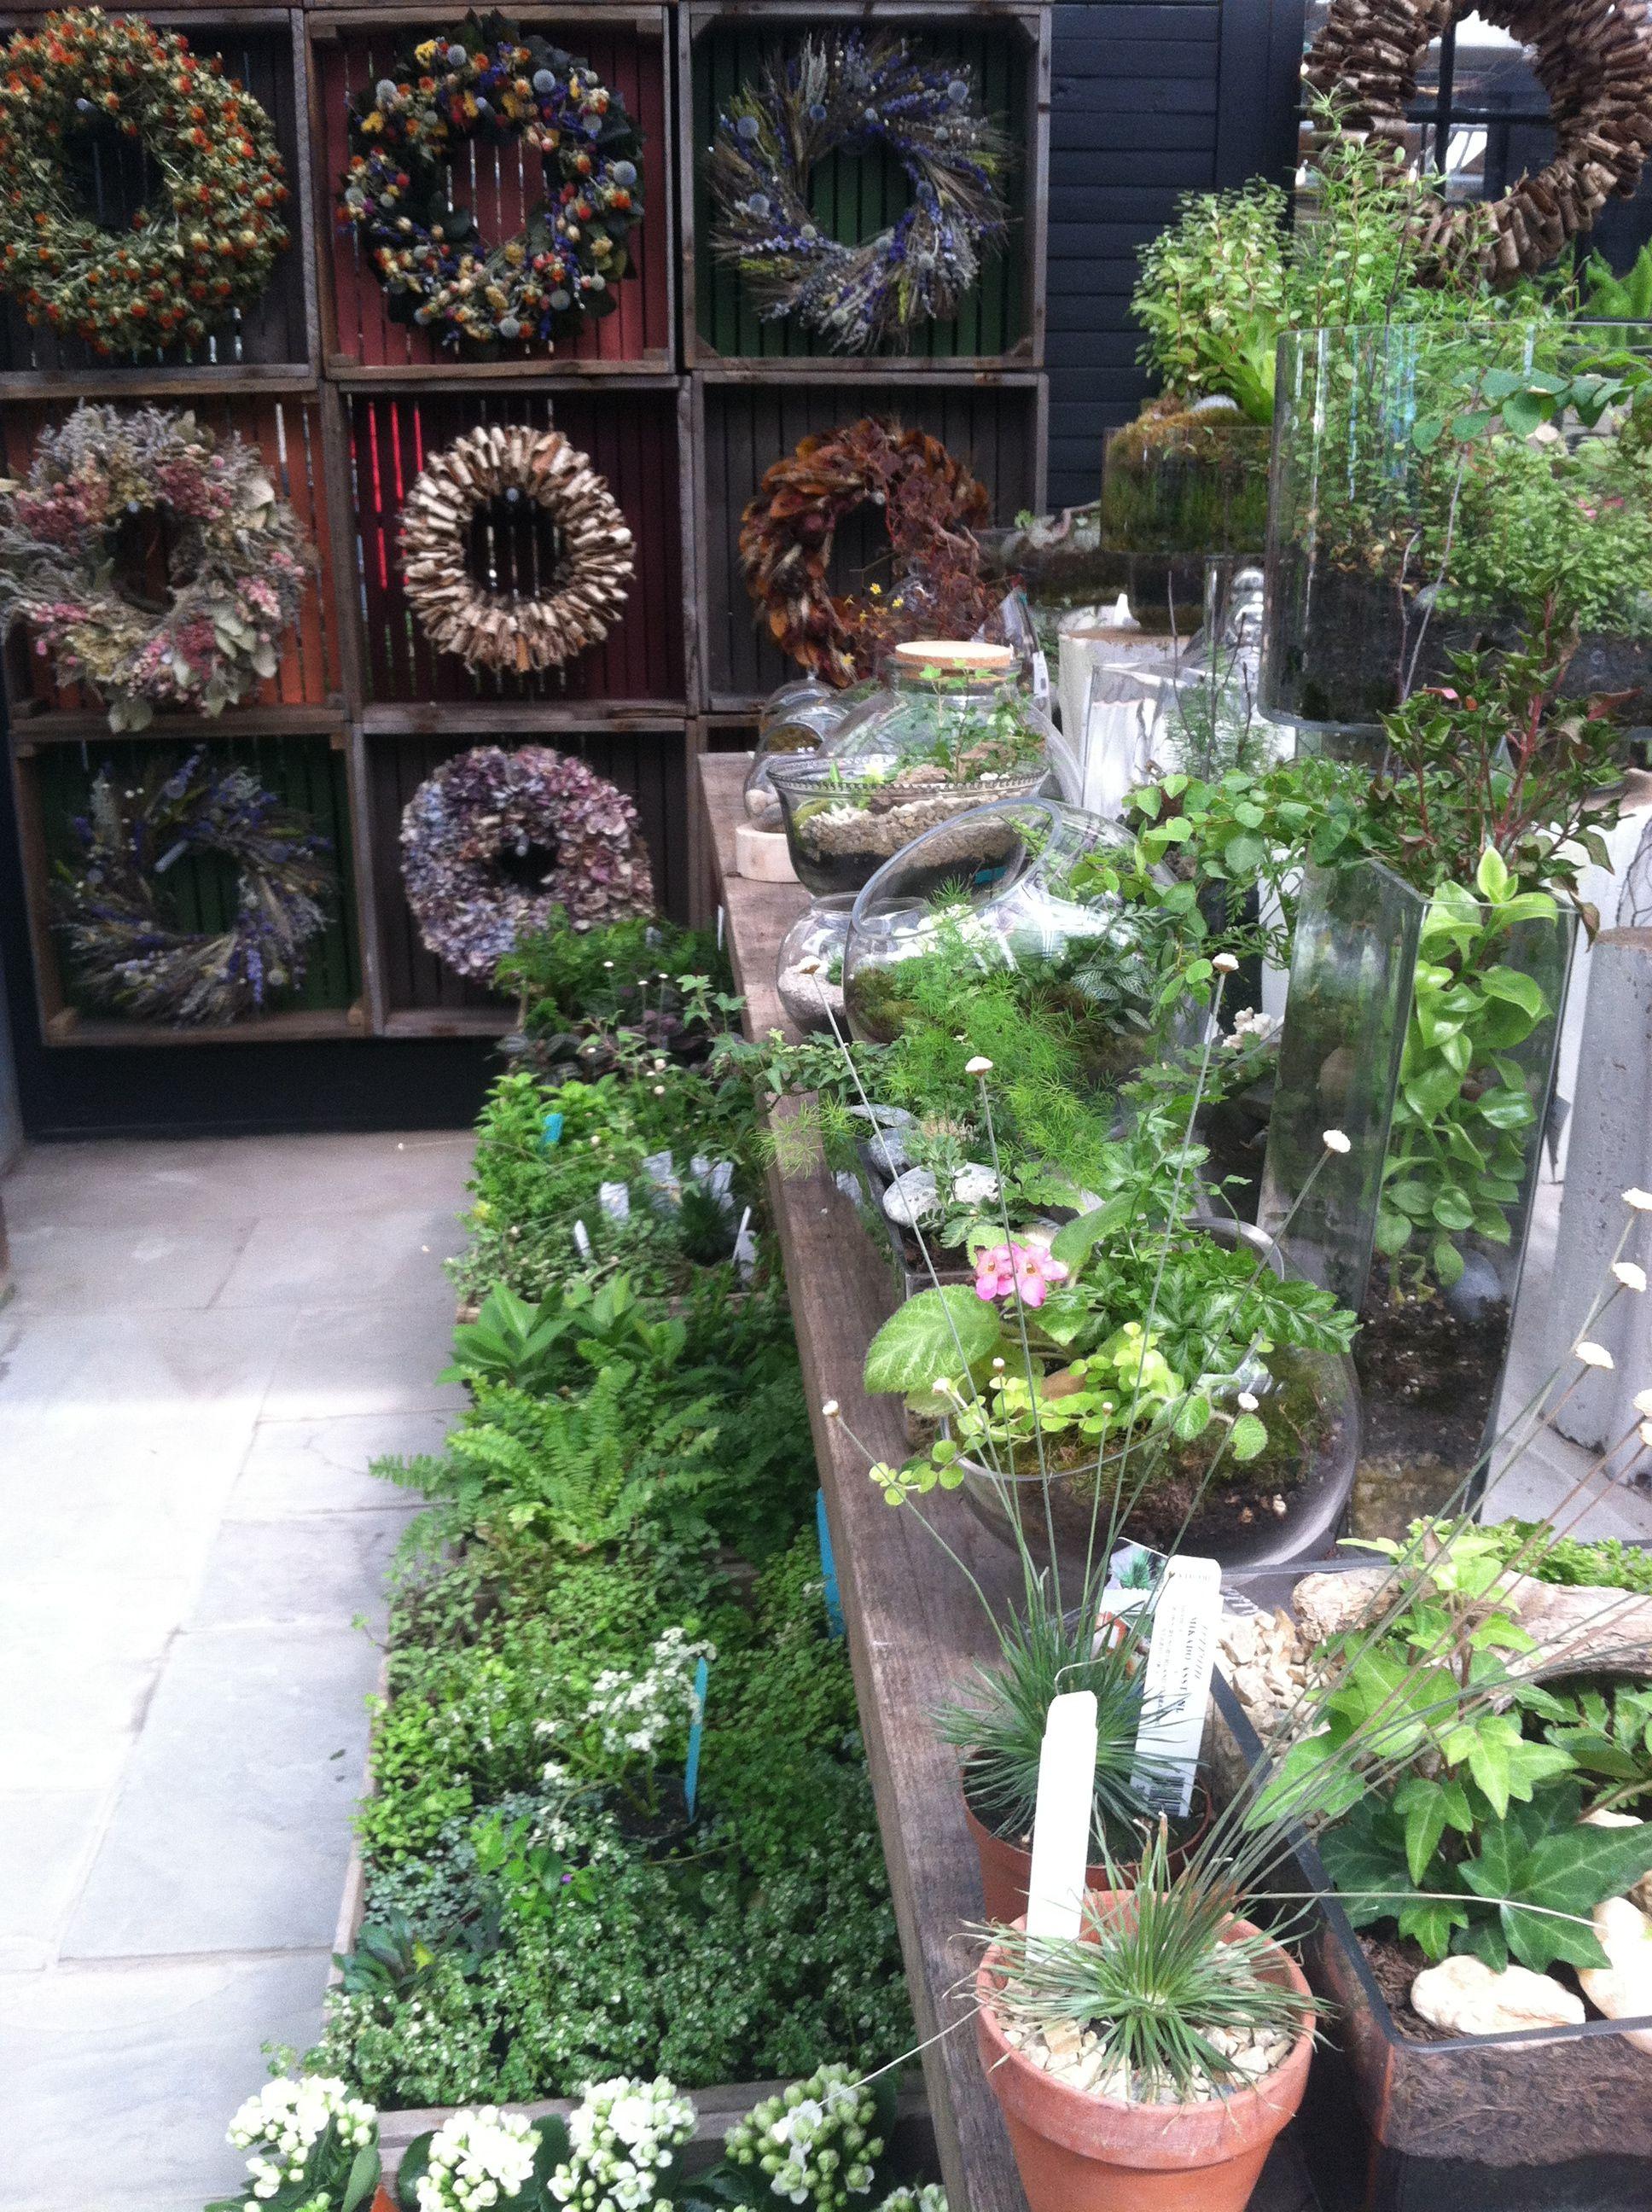 Pretty wreaths and displays Garden center displays